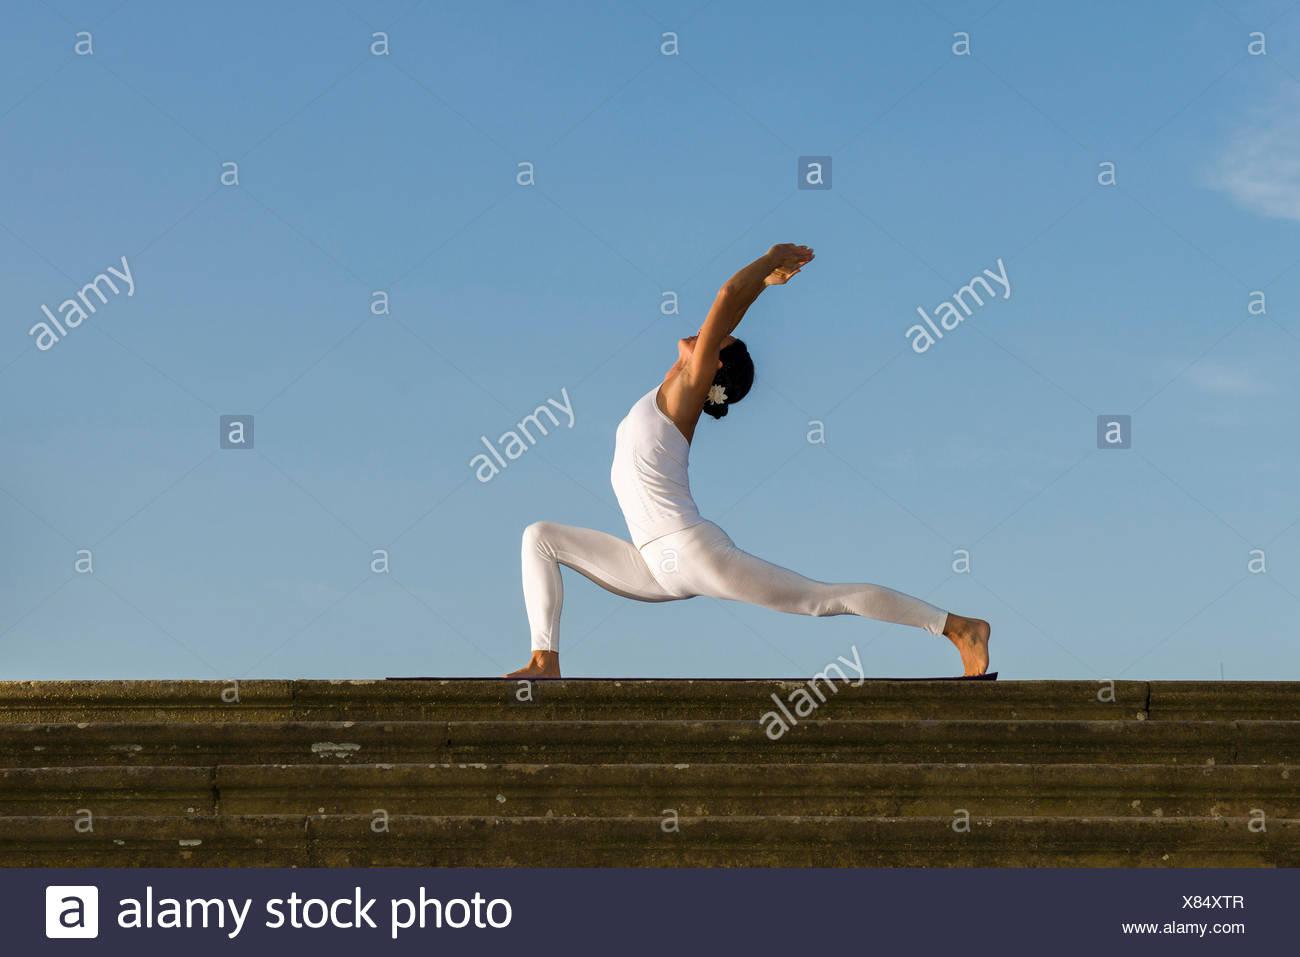 Young woman practising Hatha yoga, outdoors, showing the pose Anjaneyasana, Chandrasana, Half moon pose - Stock Image